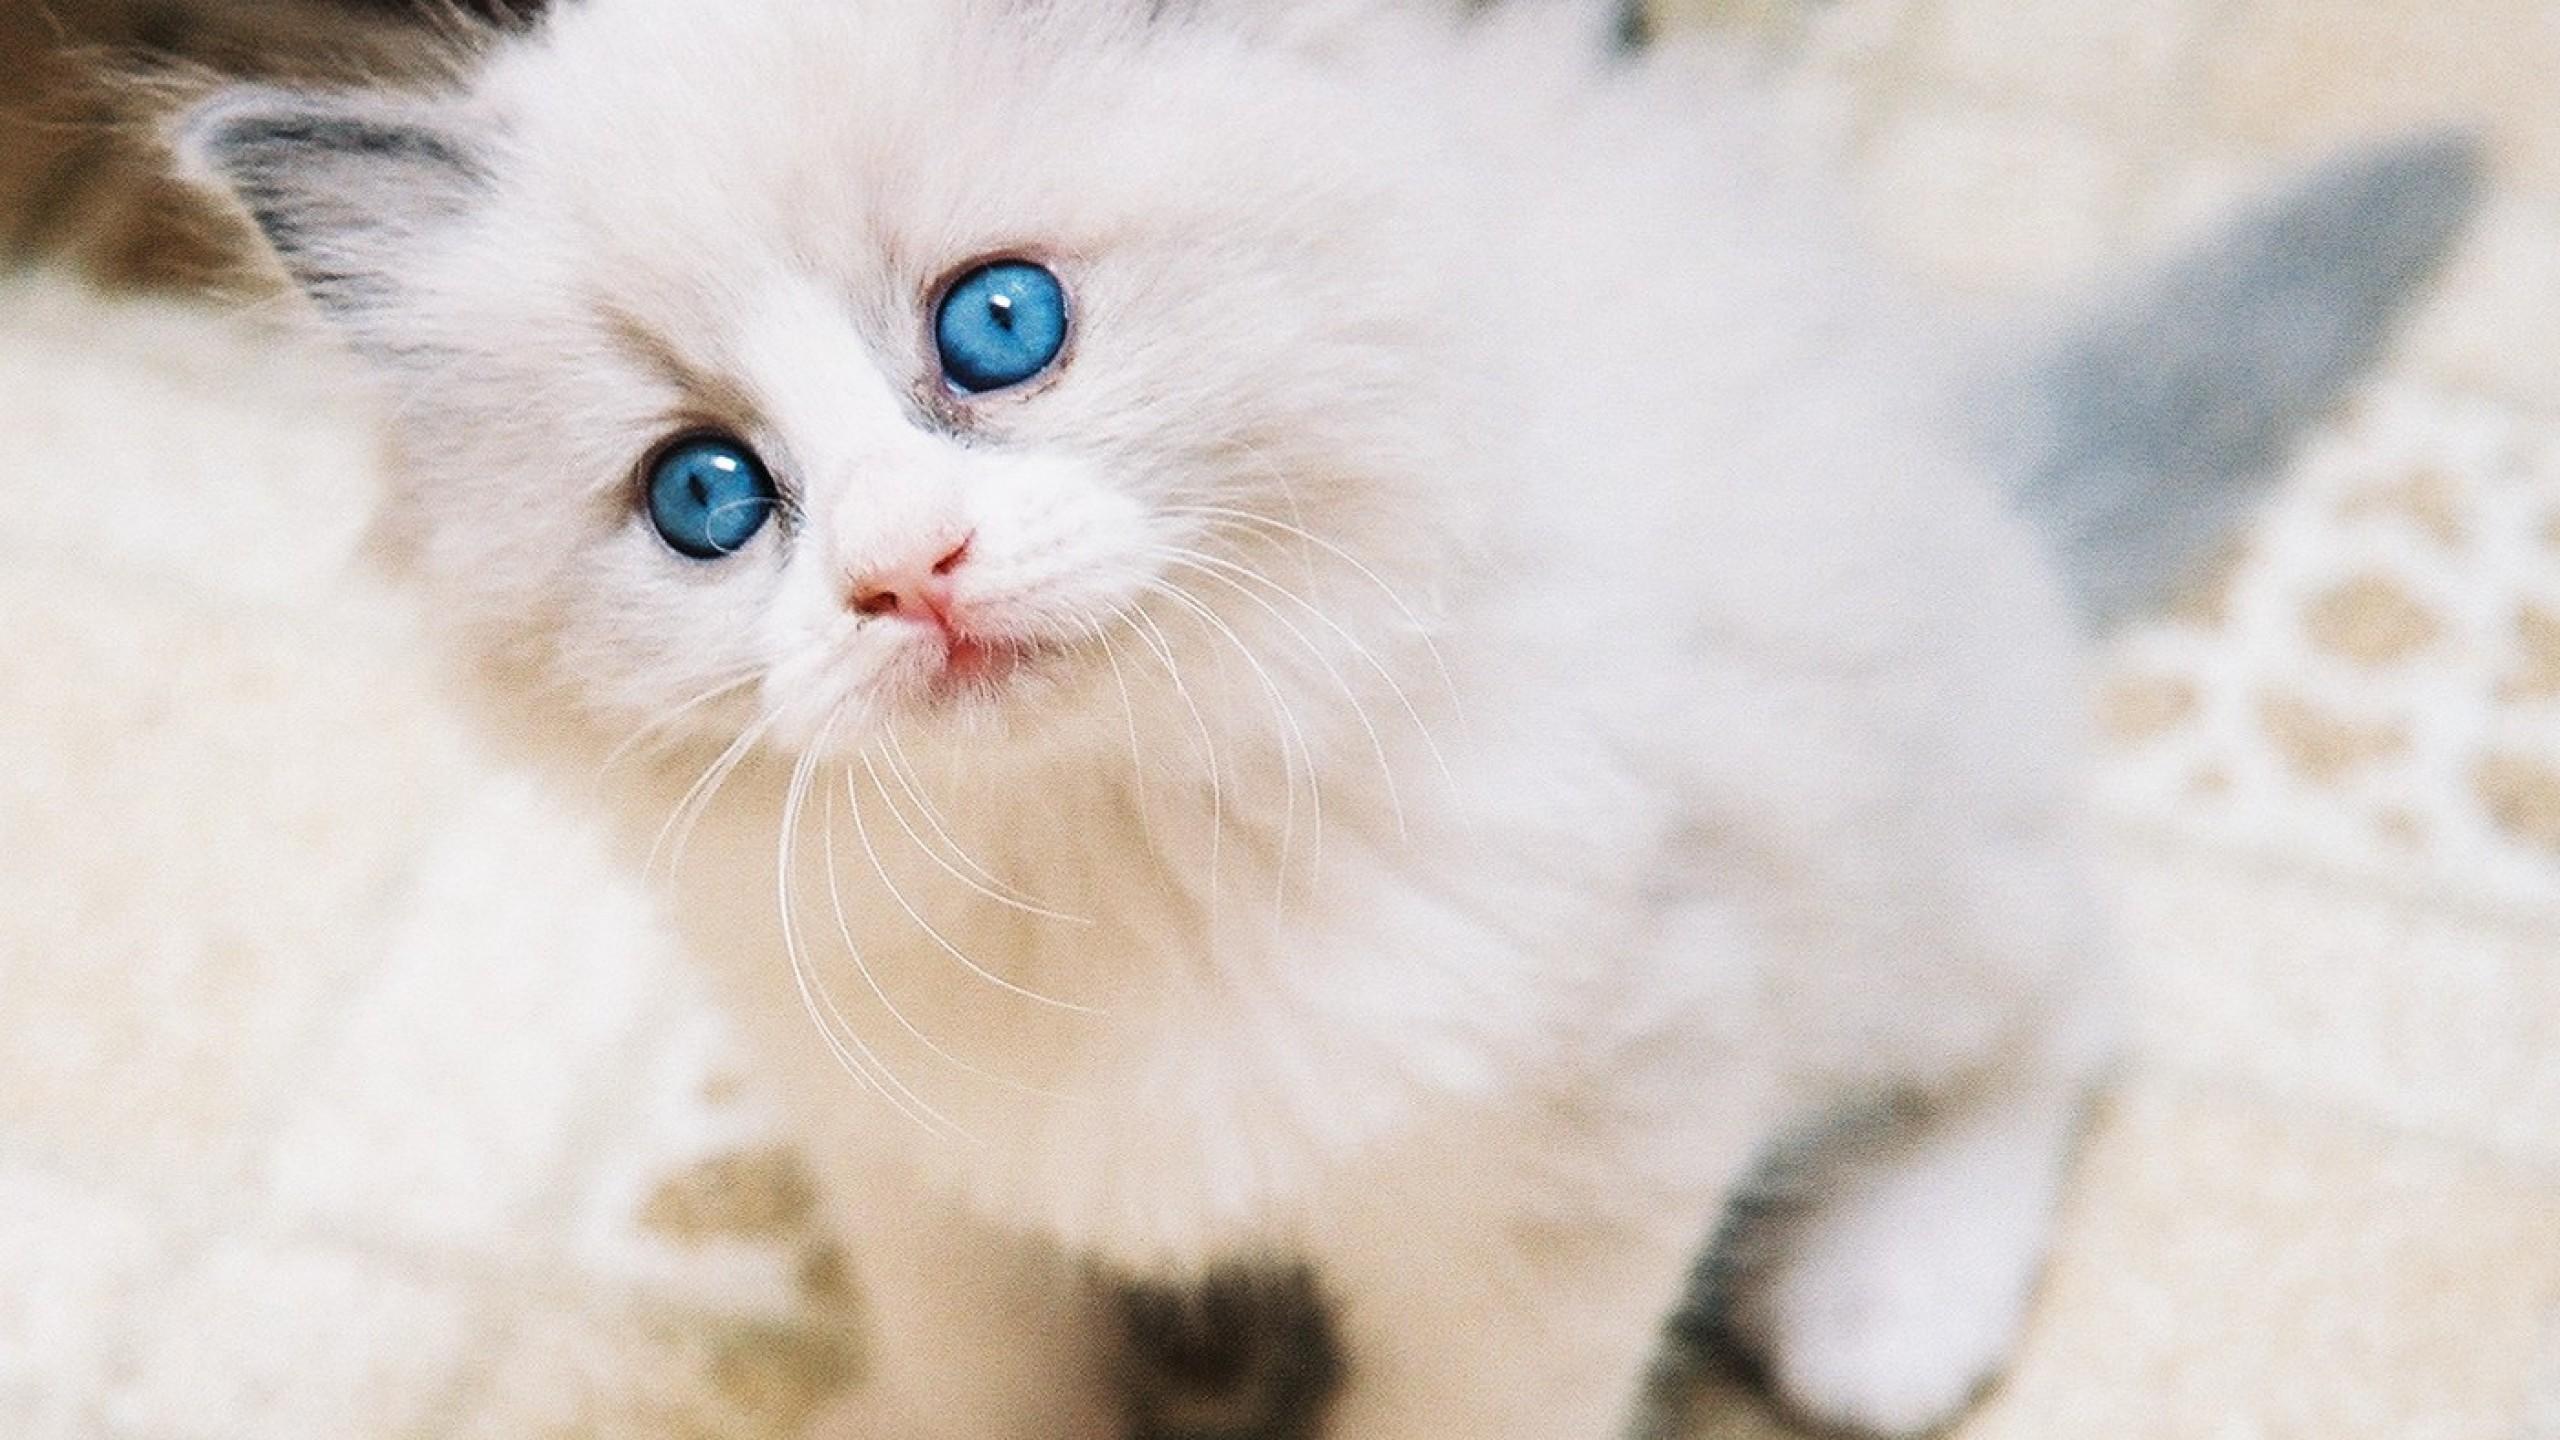 Baby White Cute Kittens - HD Wallpaper